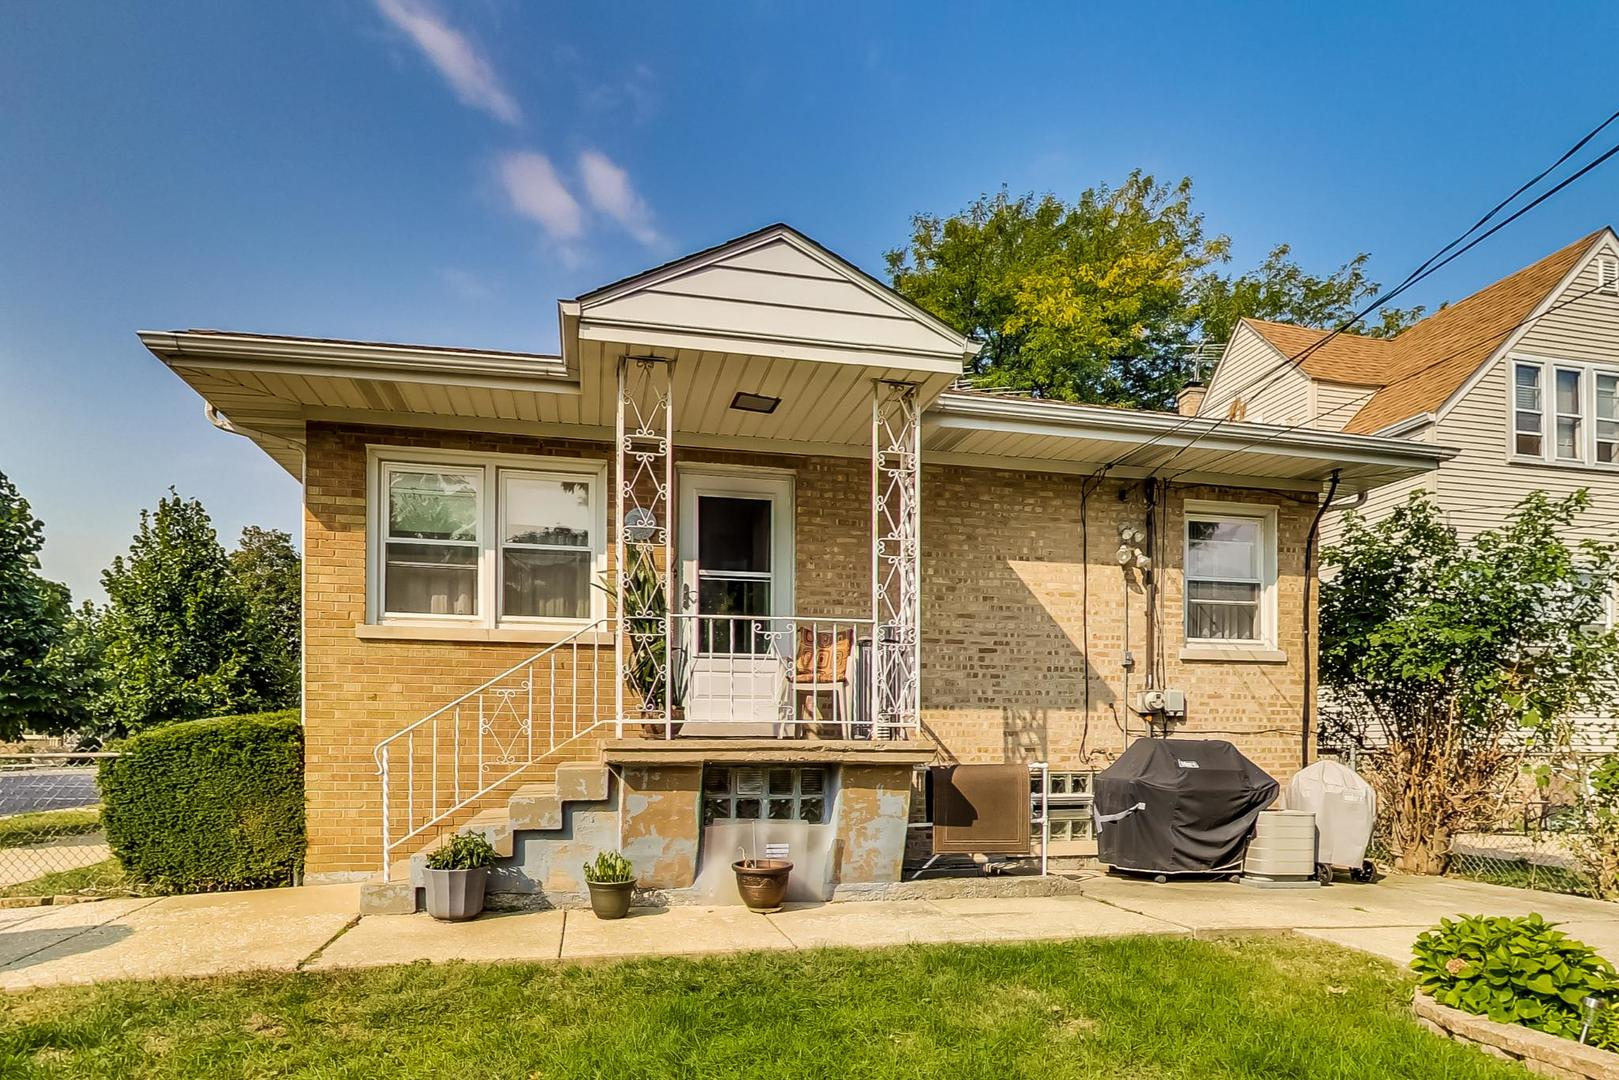 3901 Nora ,Chicago, Illinois 60634